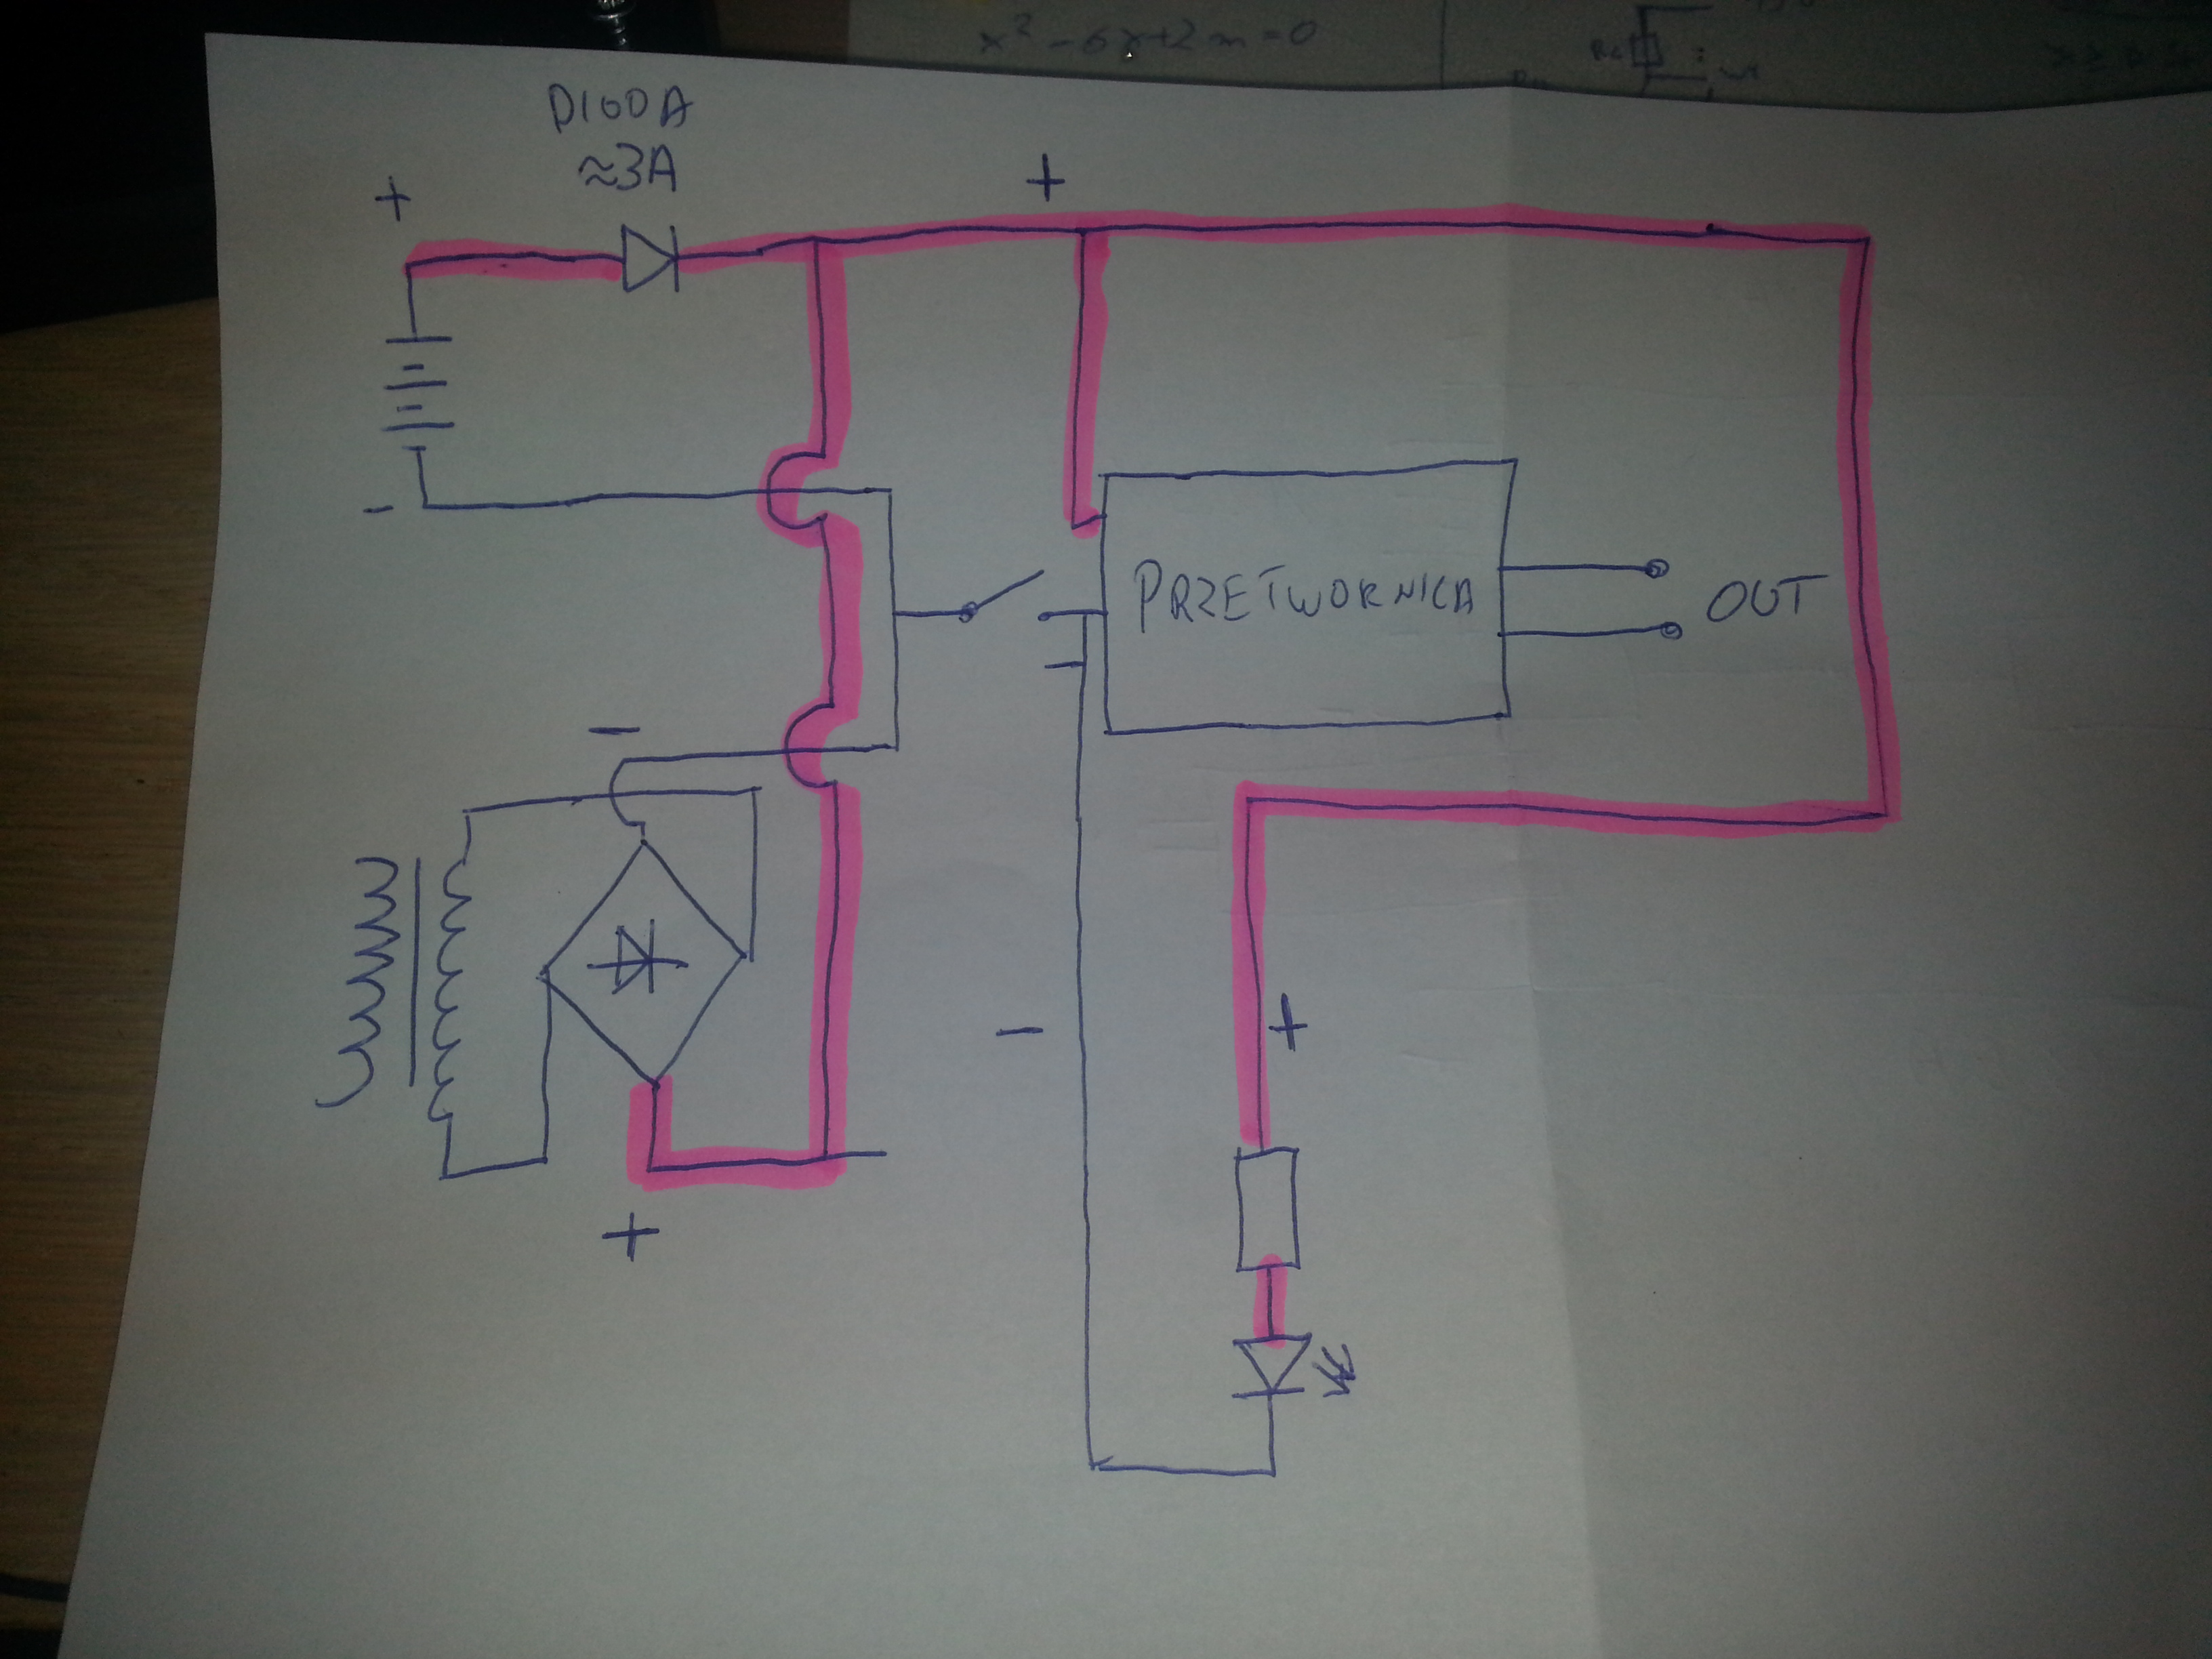 Zasilanie przetwornicy HID 12V 3.5A z pr�dnicy + akumulator 12V